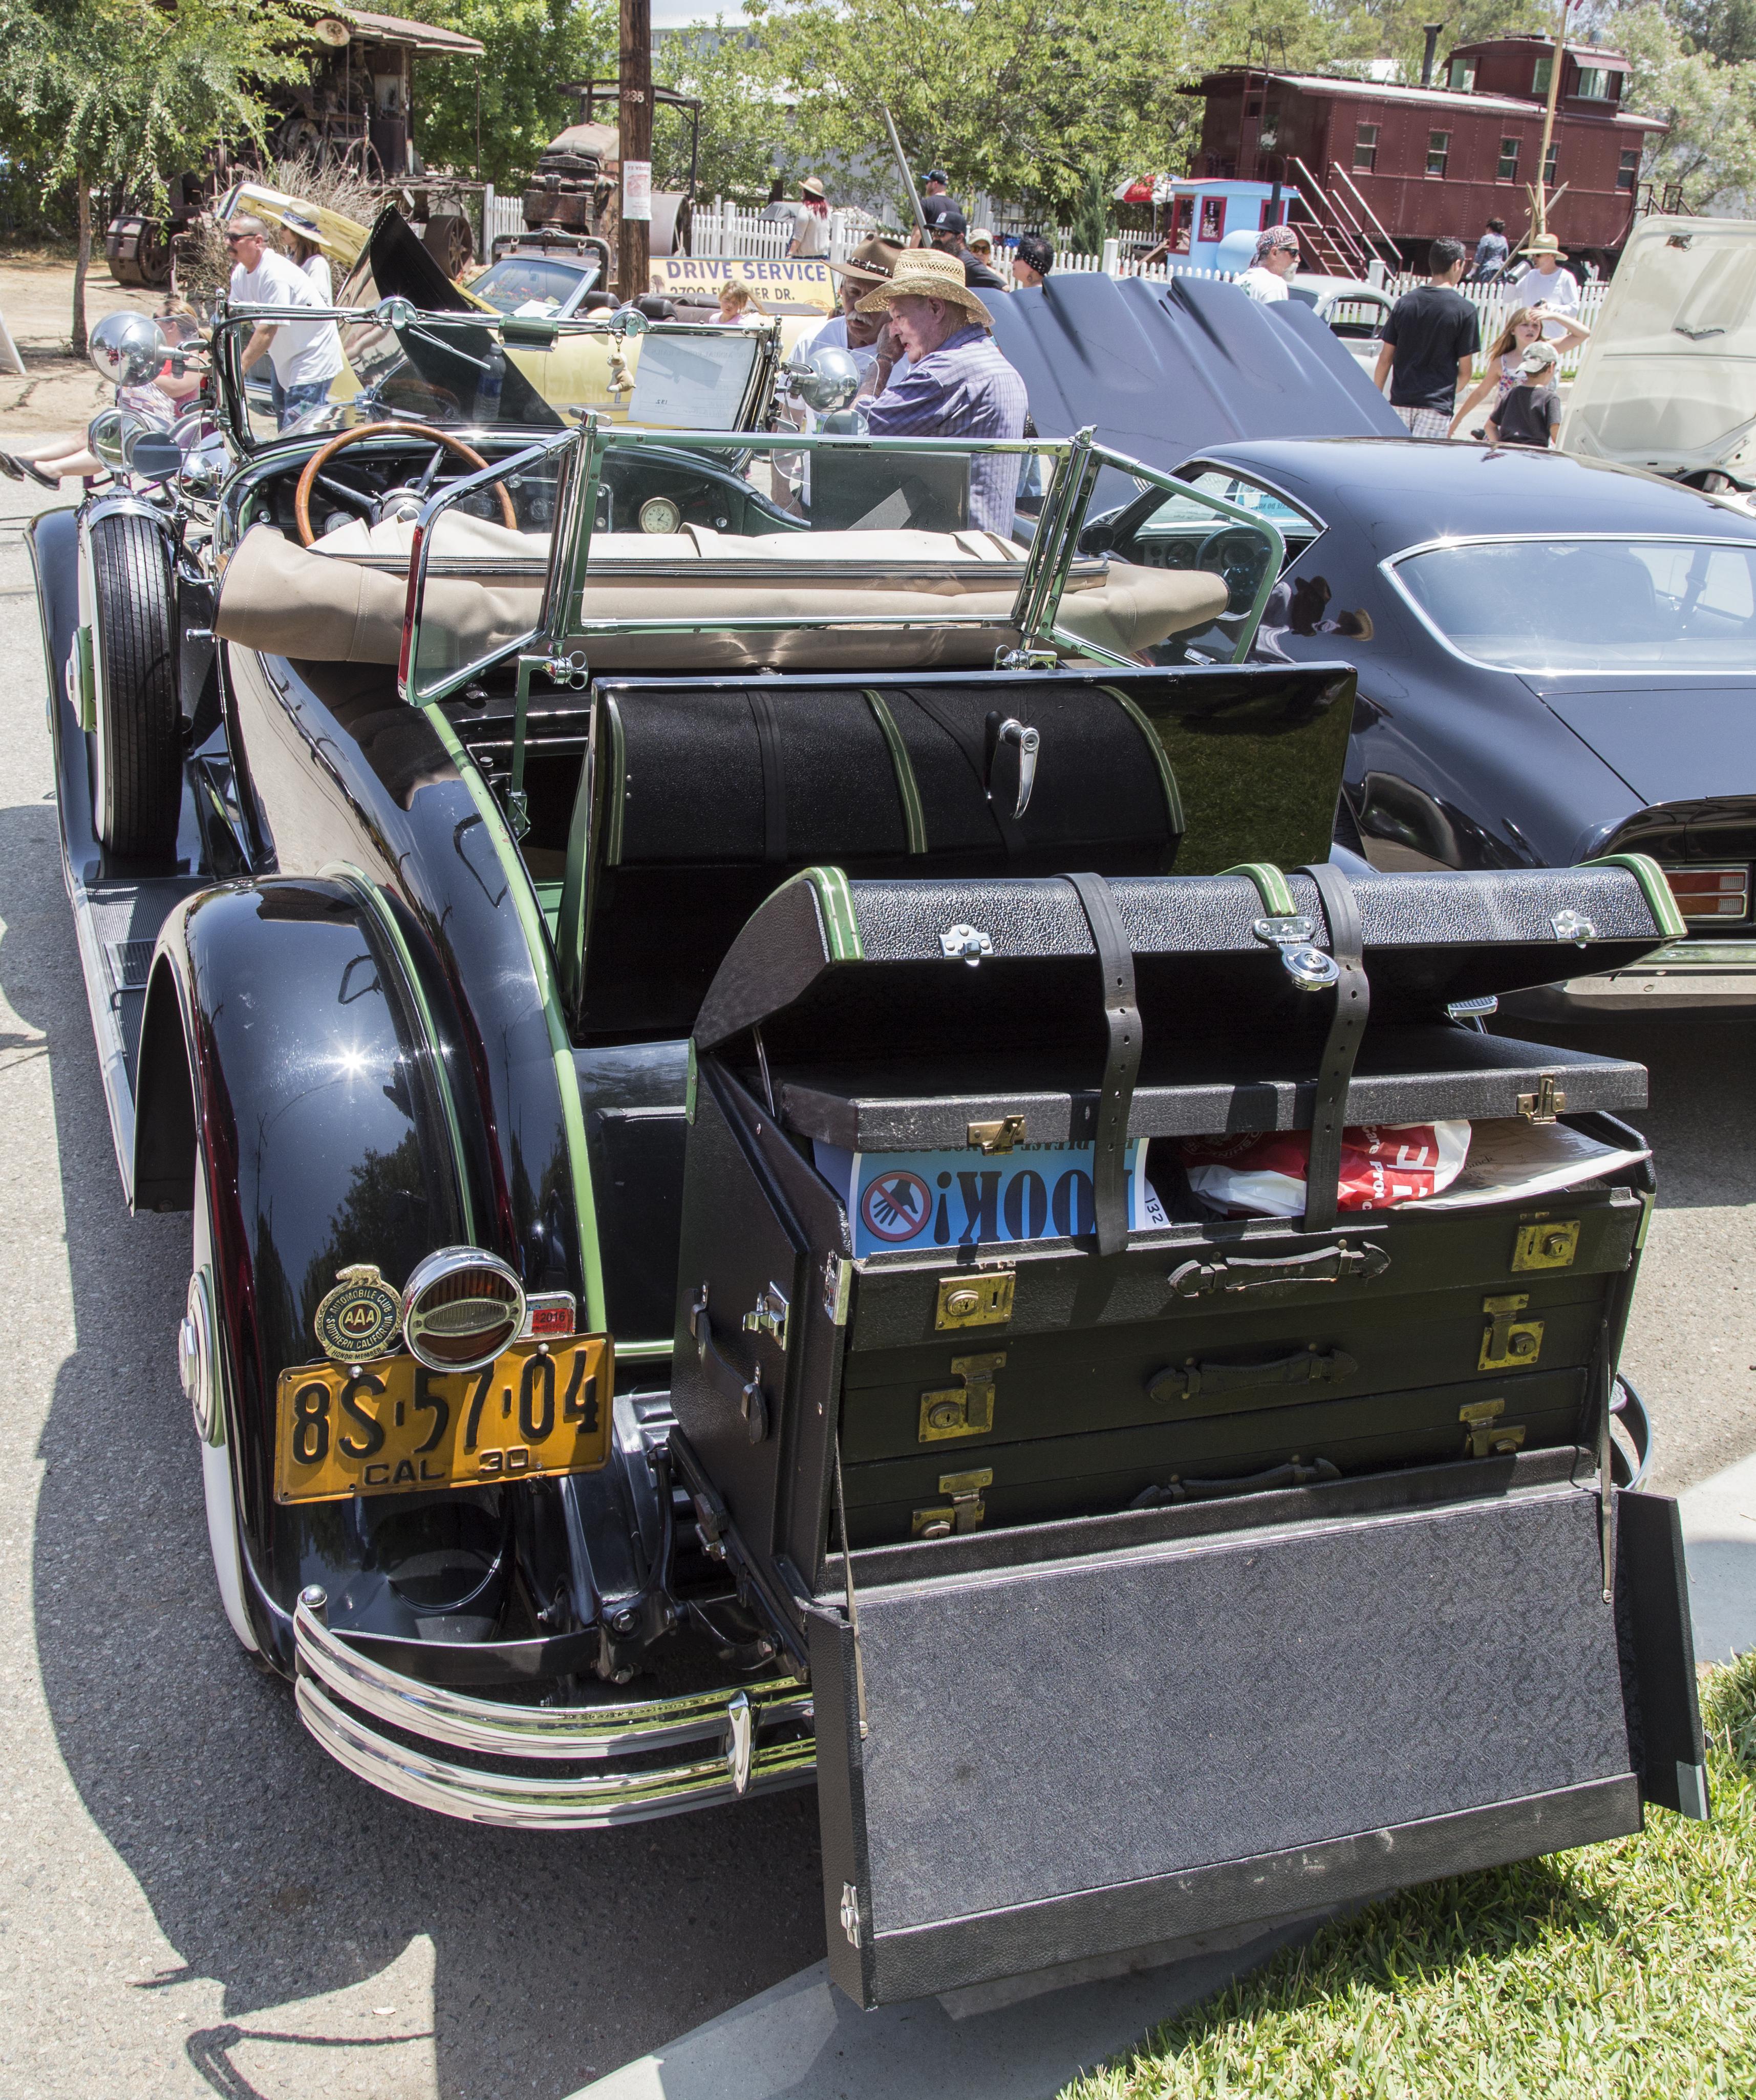 High Resolution Wallpaper | 1930 Buick Roadster 3430x4101 px